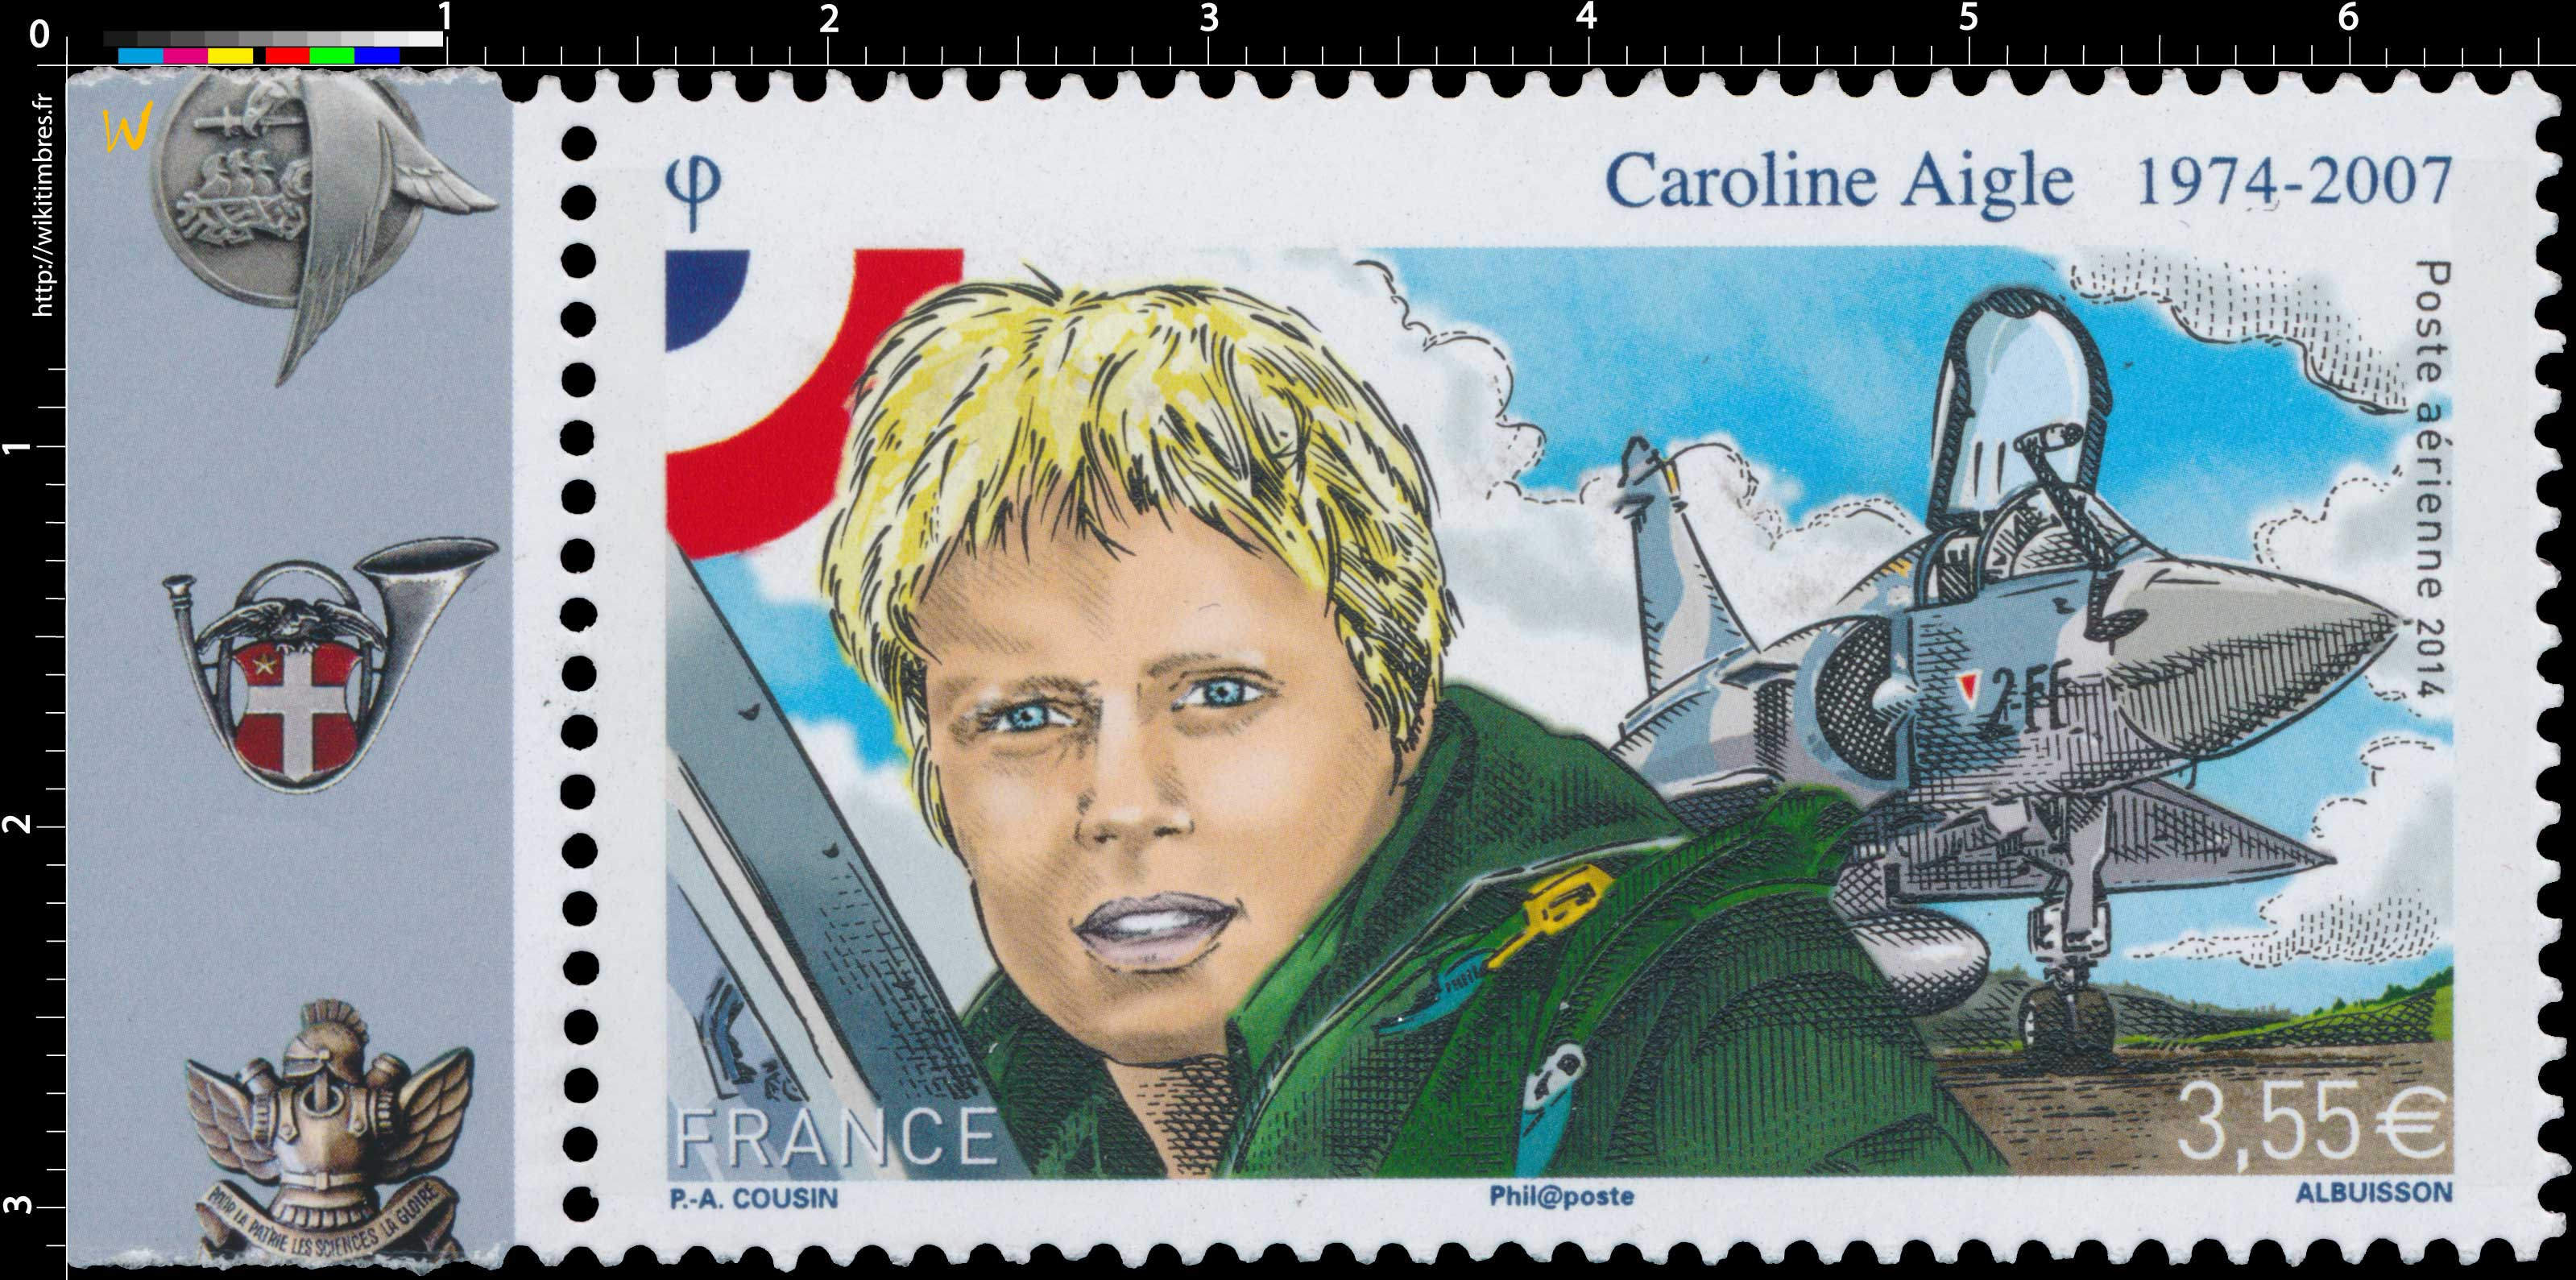 2014 Caroline Aigle 1974-2007